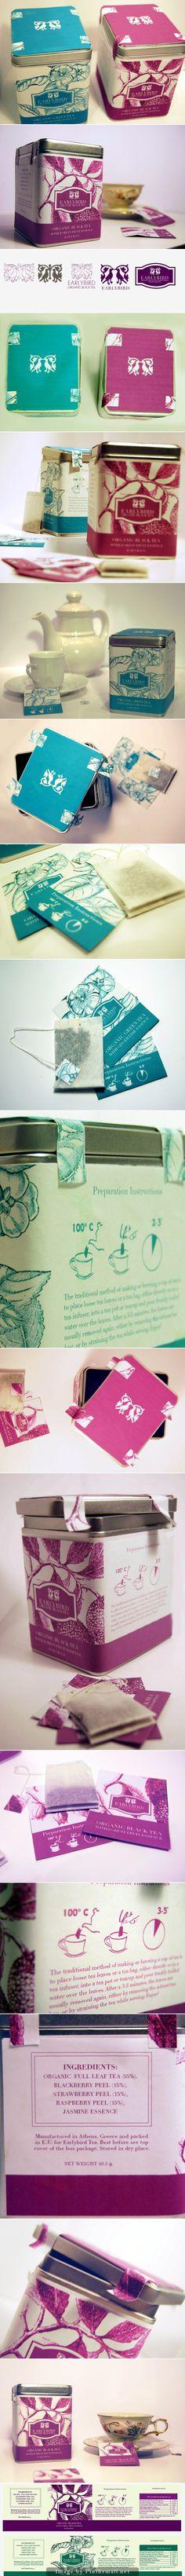 Lovely early bird organic tea #packaging curated by Packaging Diva PD  created via https://www.behance.net/gallery/Earlybird-Organic-Tea/8516531